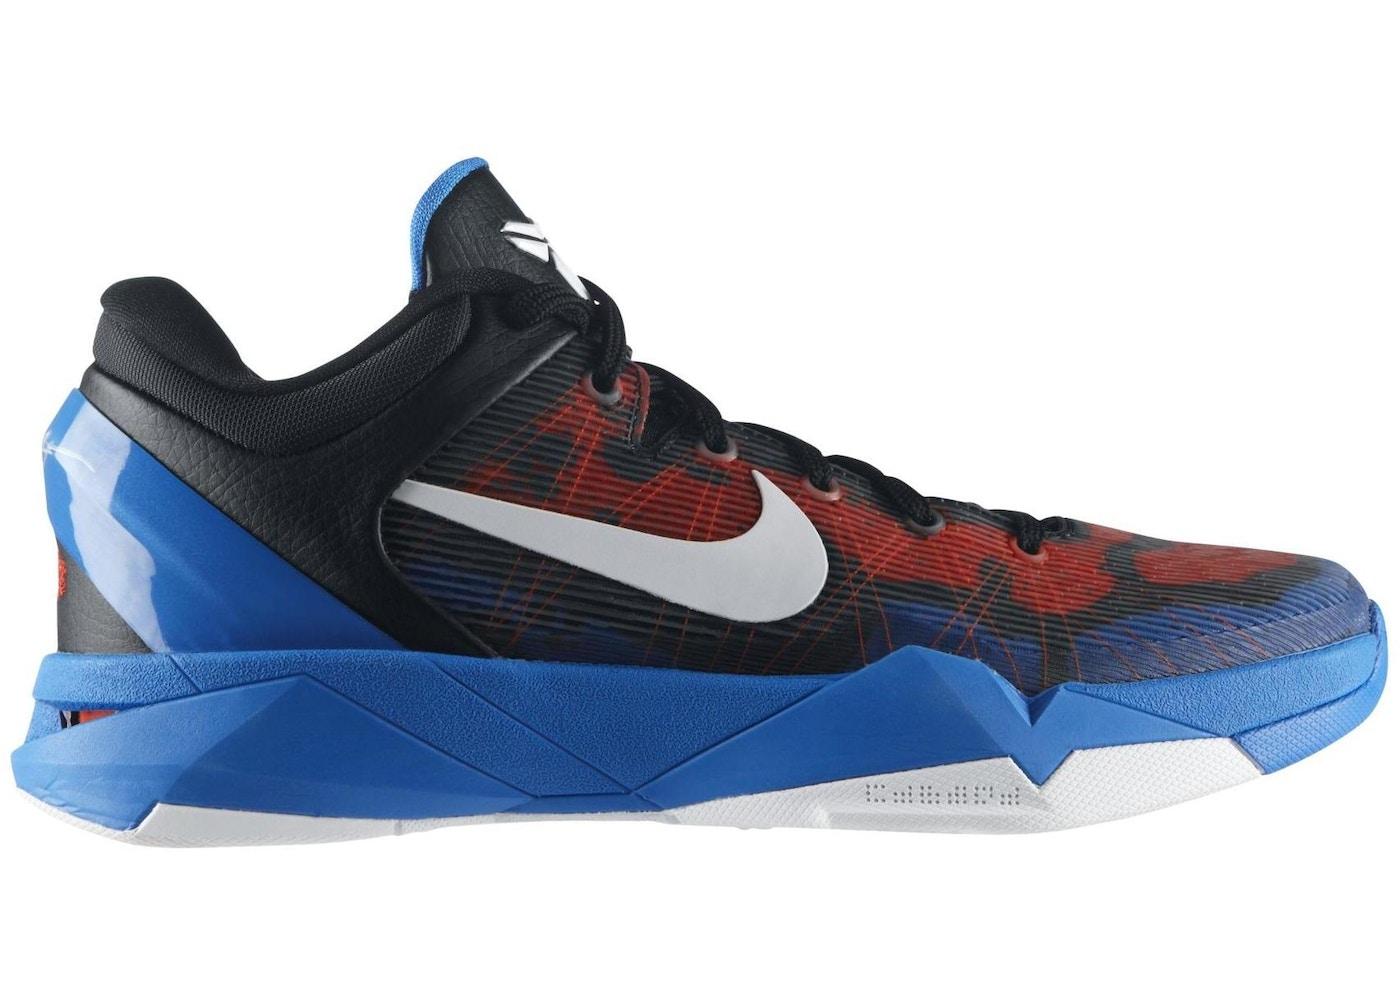 4cb486134026 Buy Nike Kobe 7 Shoes   Deadstock Sneakers